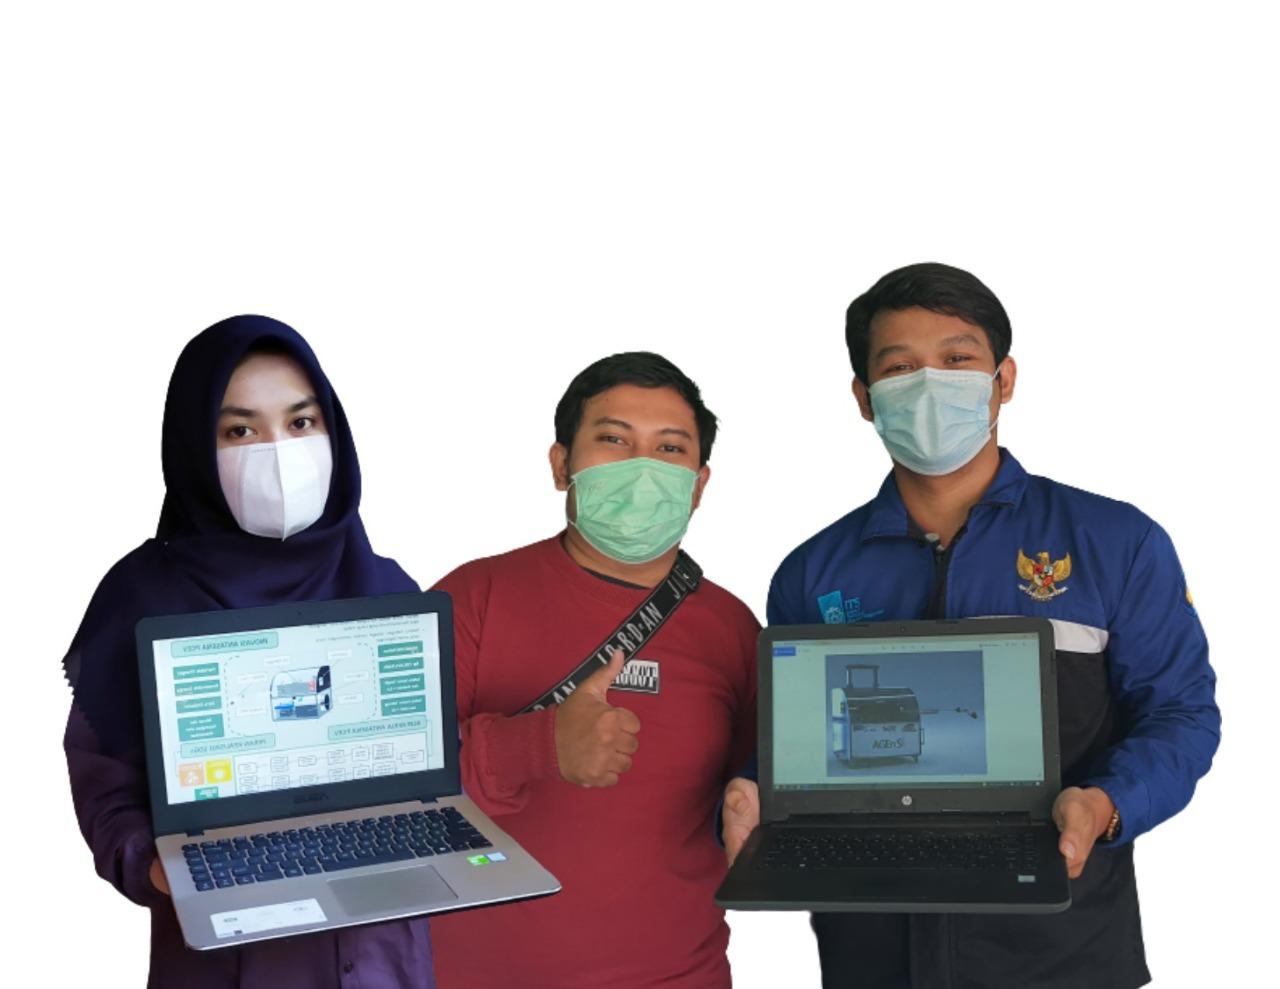 (dari kiri) Risa Wahyu Widyastuti, Rikza Octavian Pratama, dan Ibrahim Fathahillah Hizbul Islam yang tergabung dalam tim Antasena PCEV